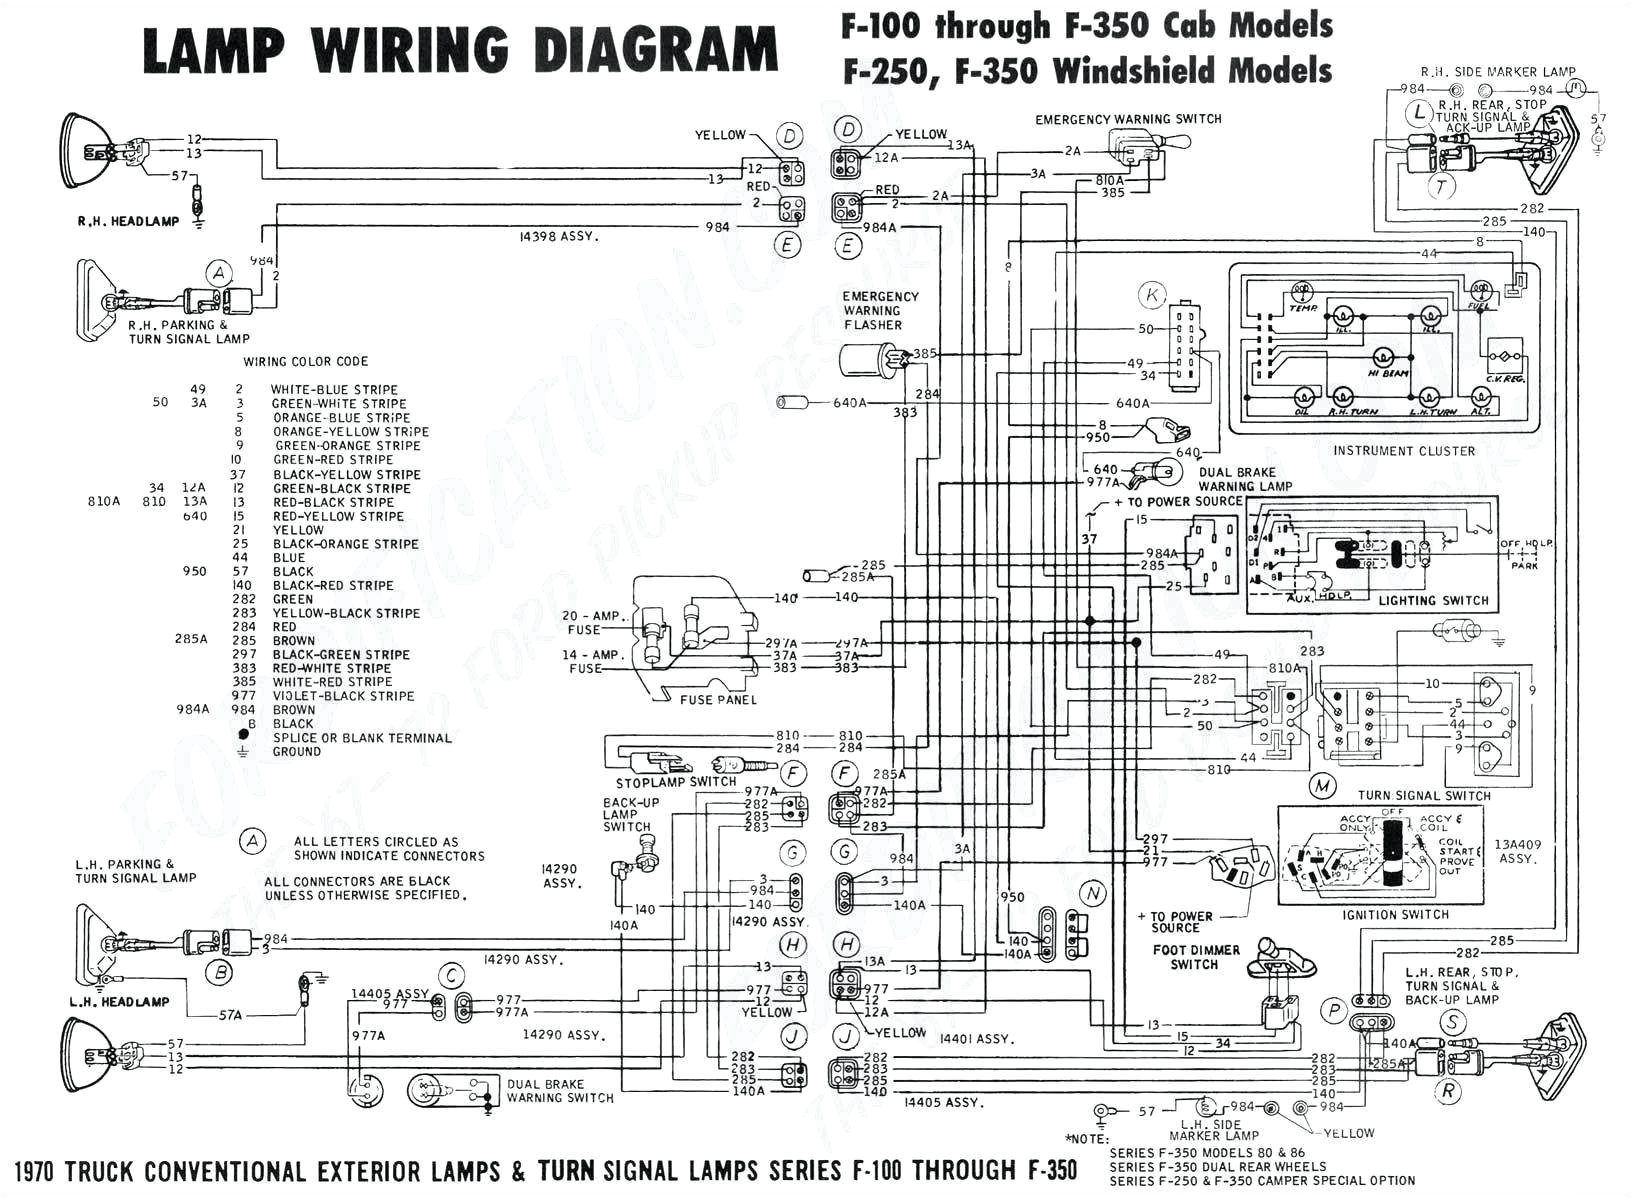 2002 chevy silverado tail light wiring diagram wiring diagram database